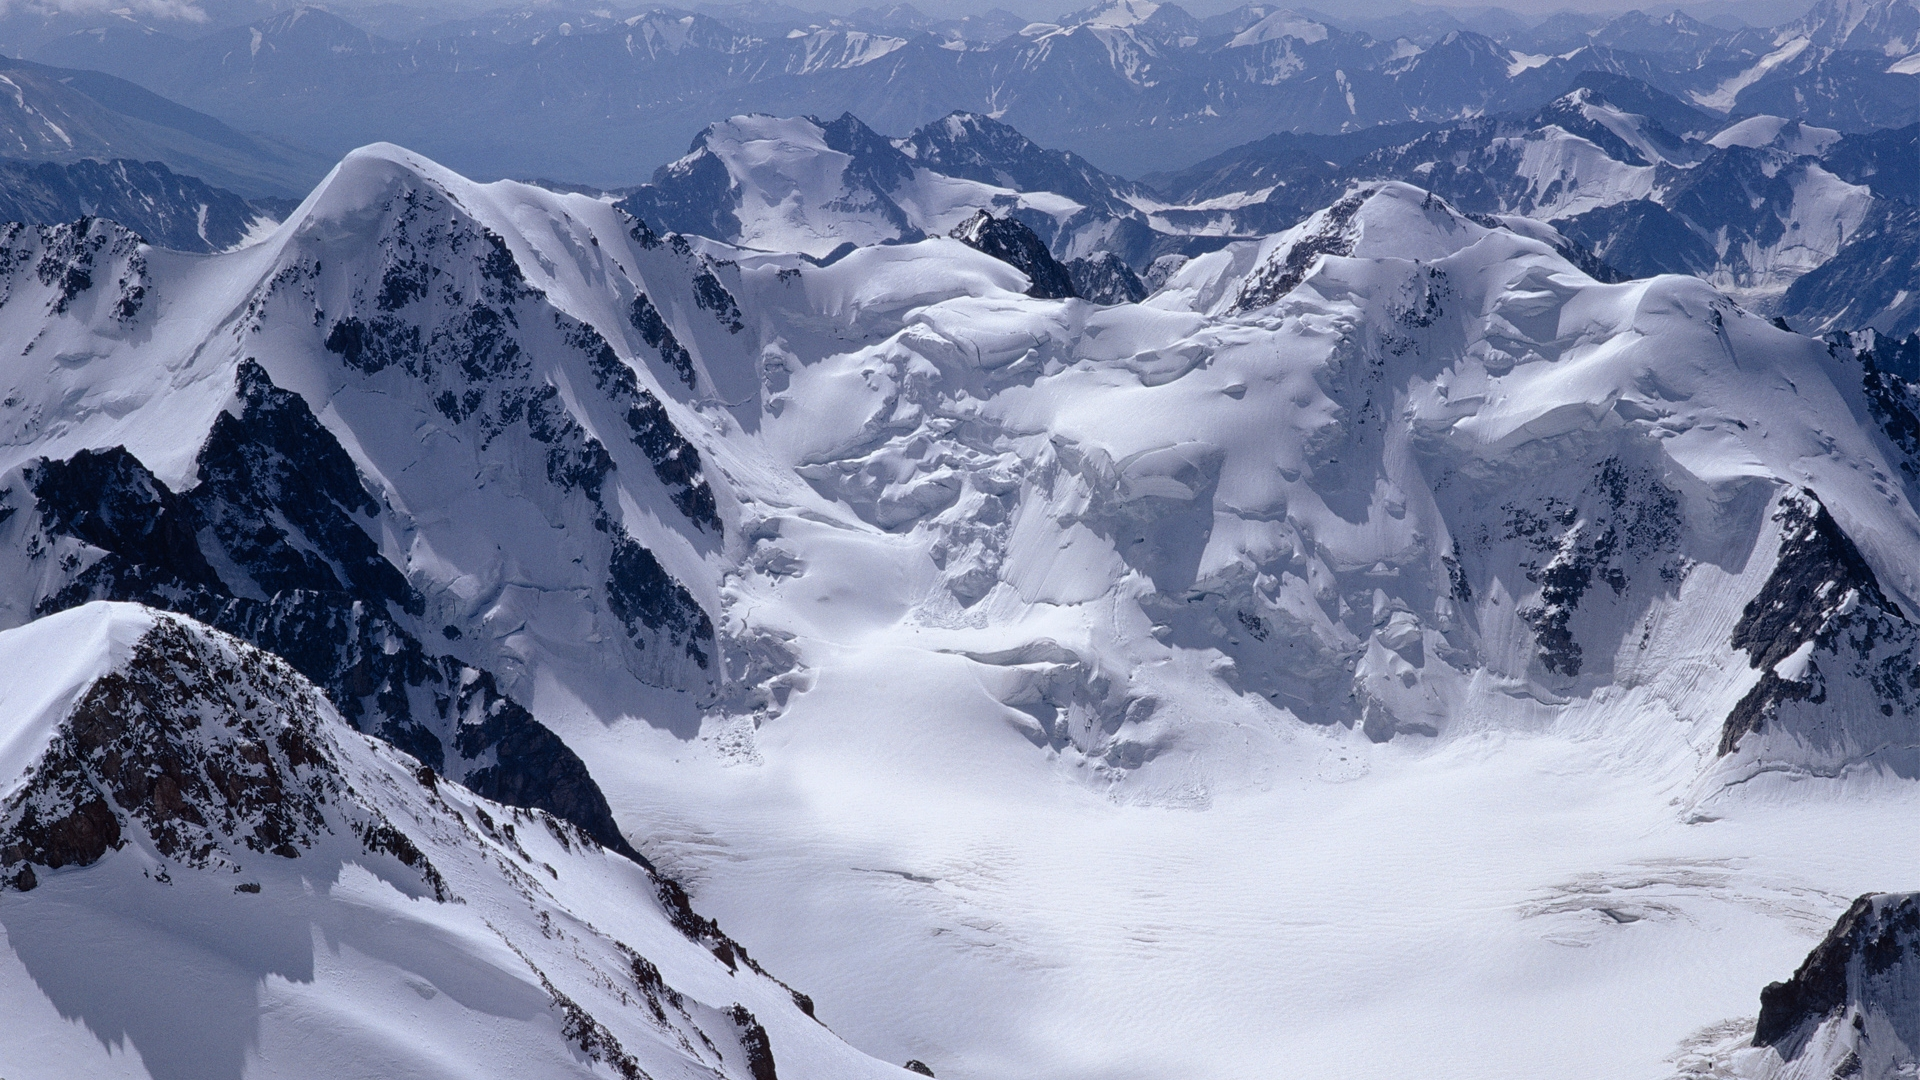 Download snowy mountain wallpaper HD wallpaper 1920x1080